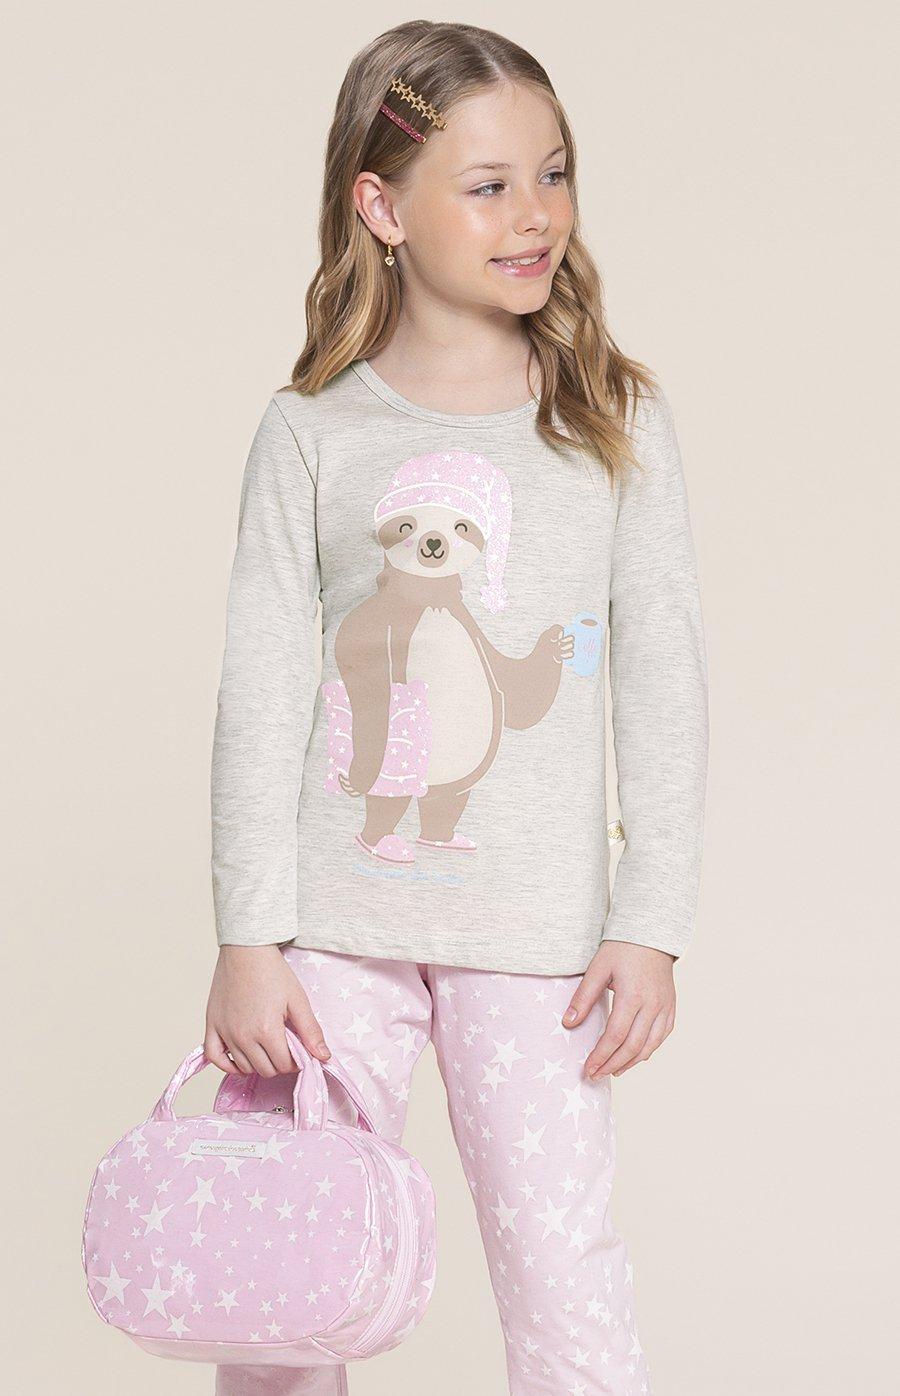 Pijama Infantil 1/2 Malha Preguicinha Inverno 2020 SWEET STORIES